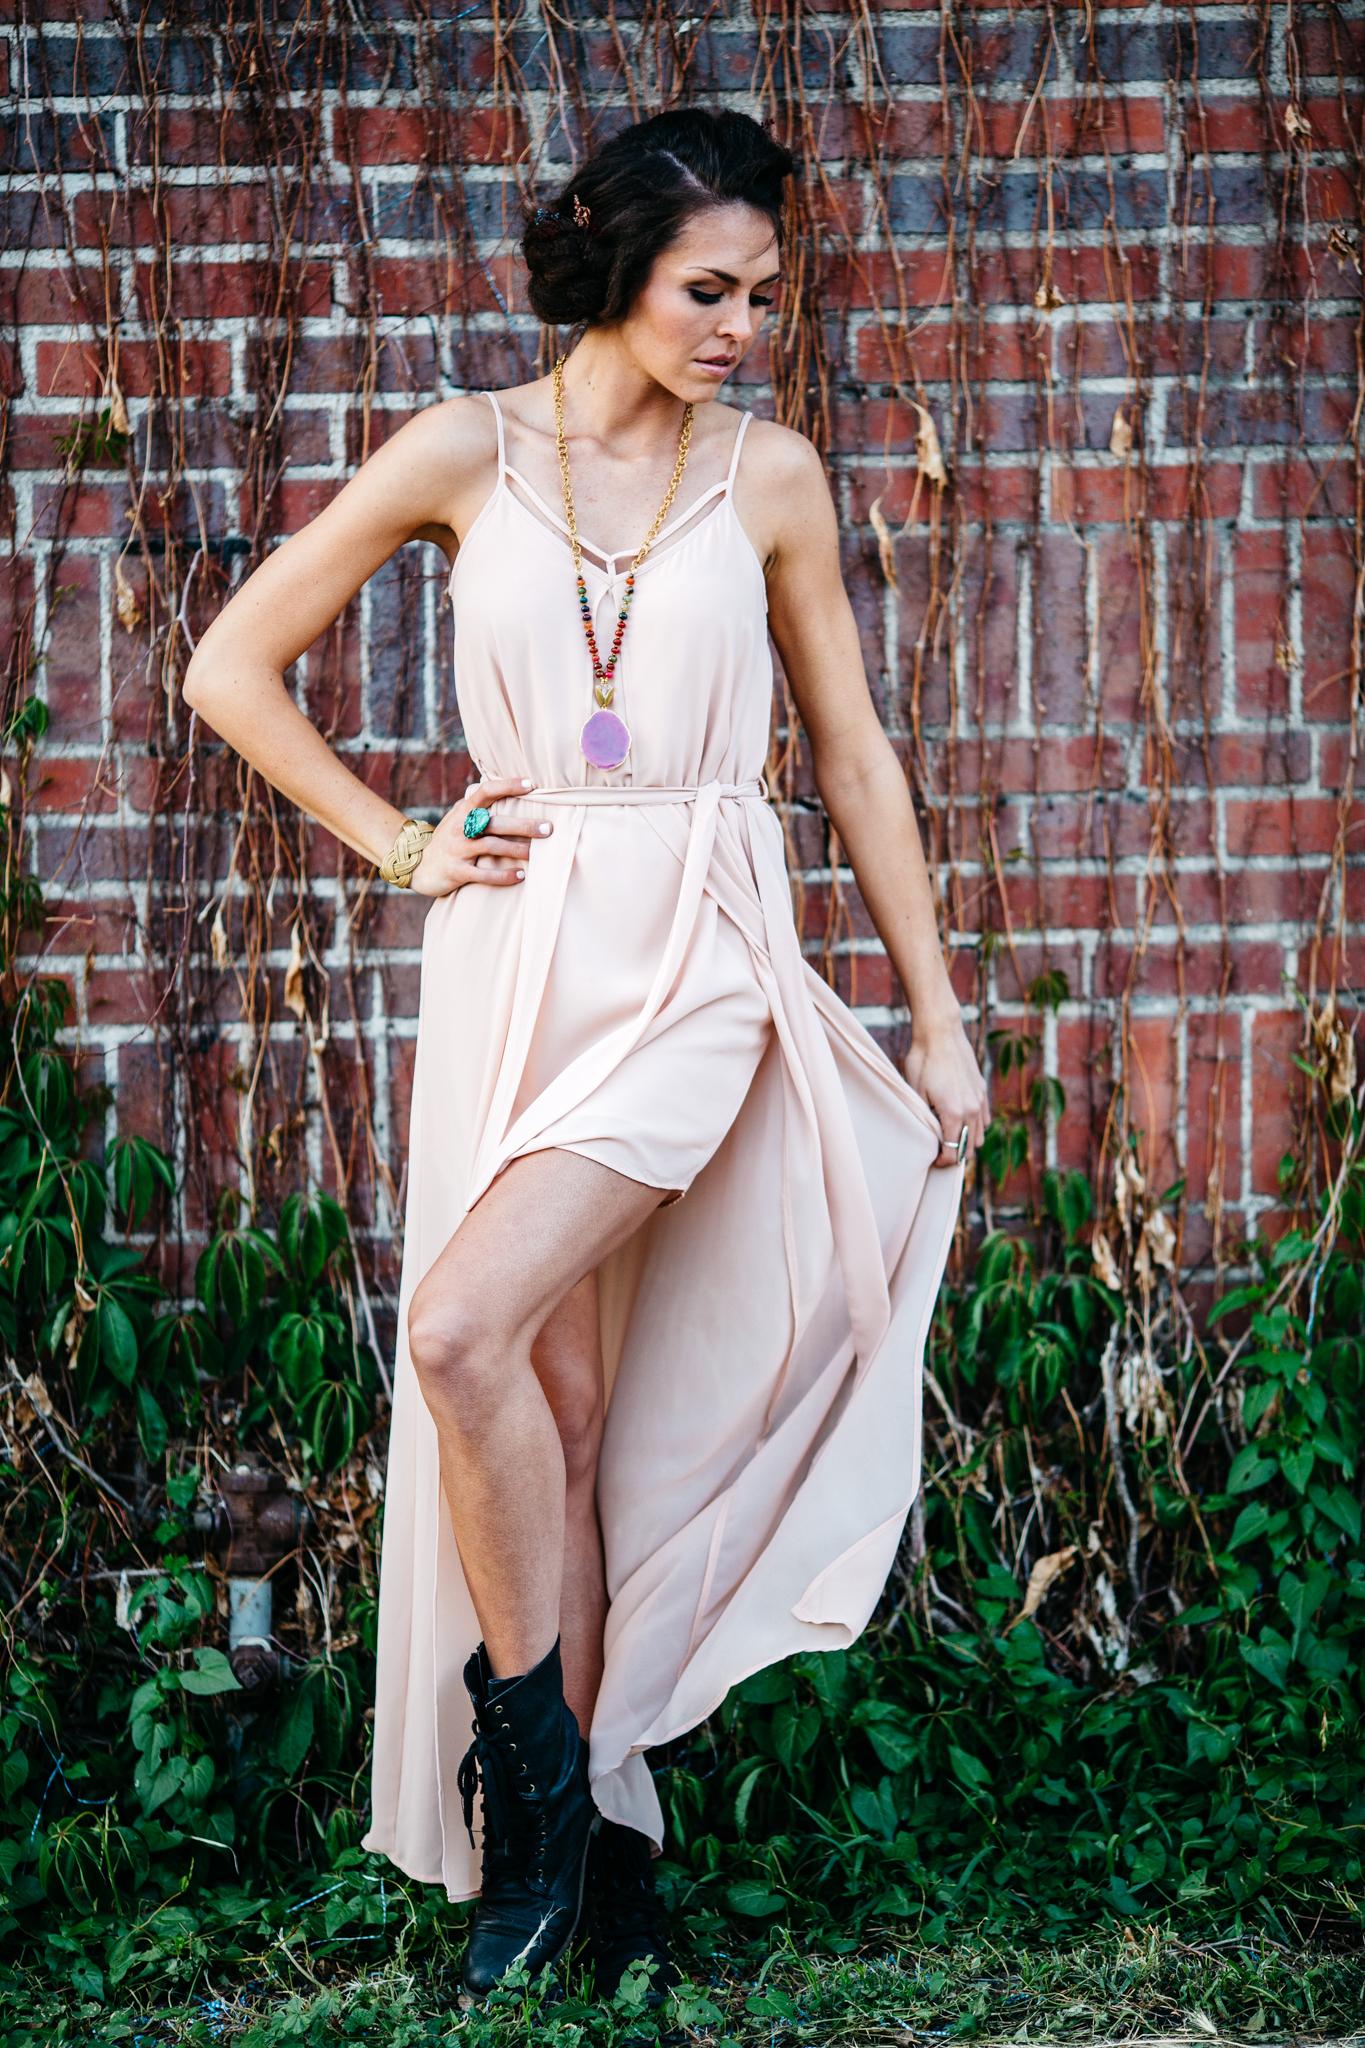 denver fashion photography (34 of 54)